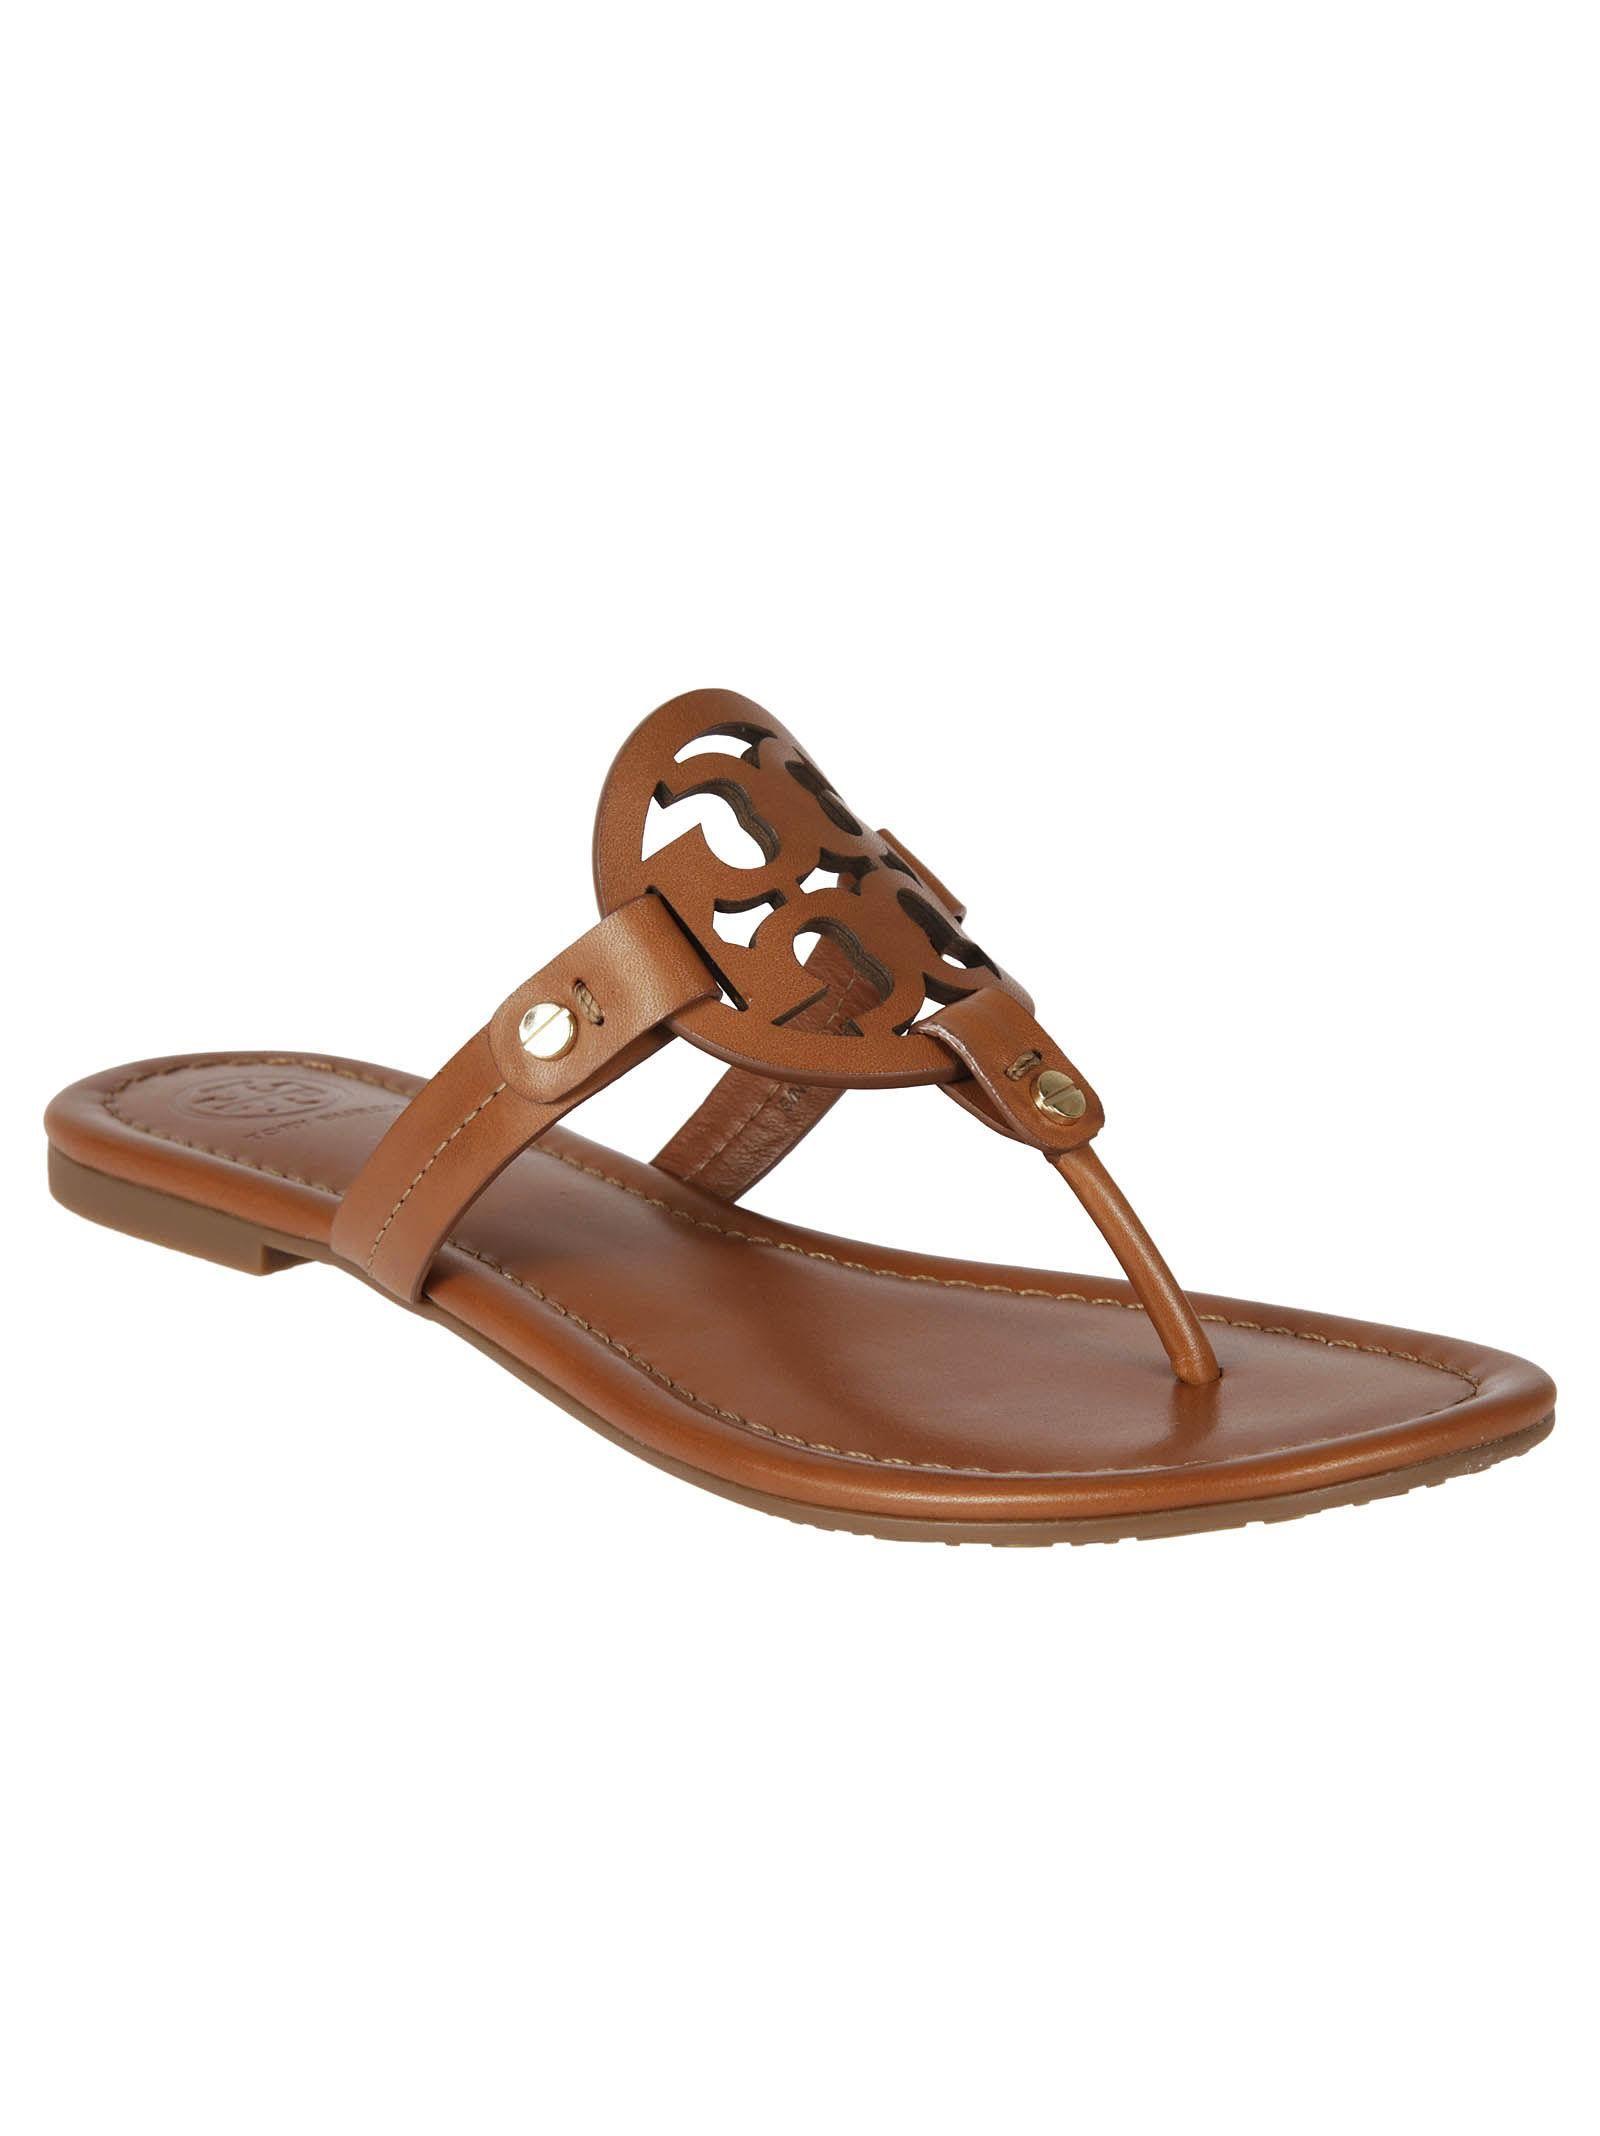 13fd7526a7c622 TORY BURCH MILLER FLAT SANDALS.  toryburch  shoes   Leather Flip Flops